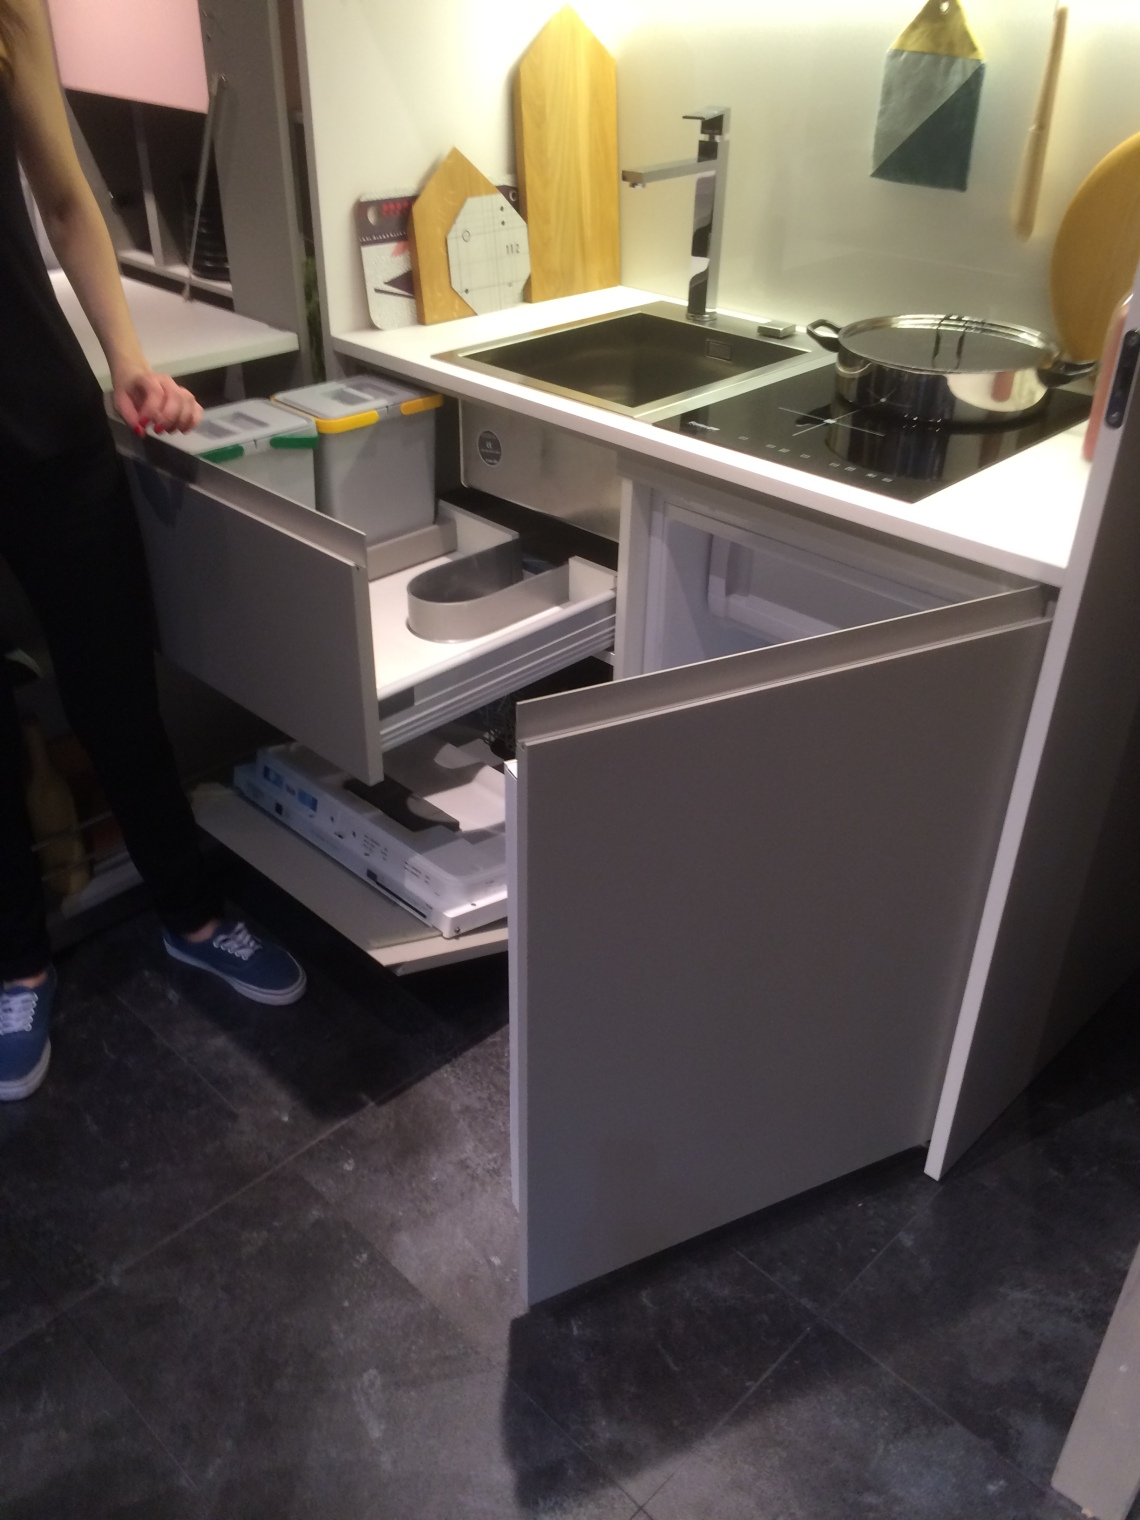 Kitchen in a box.